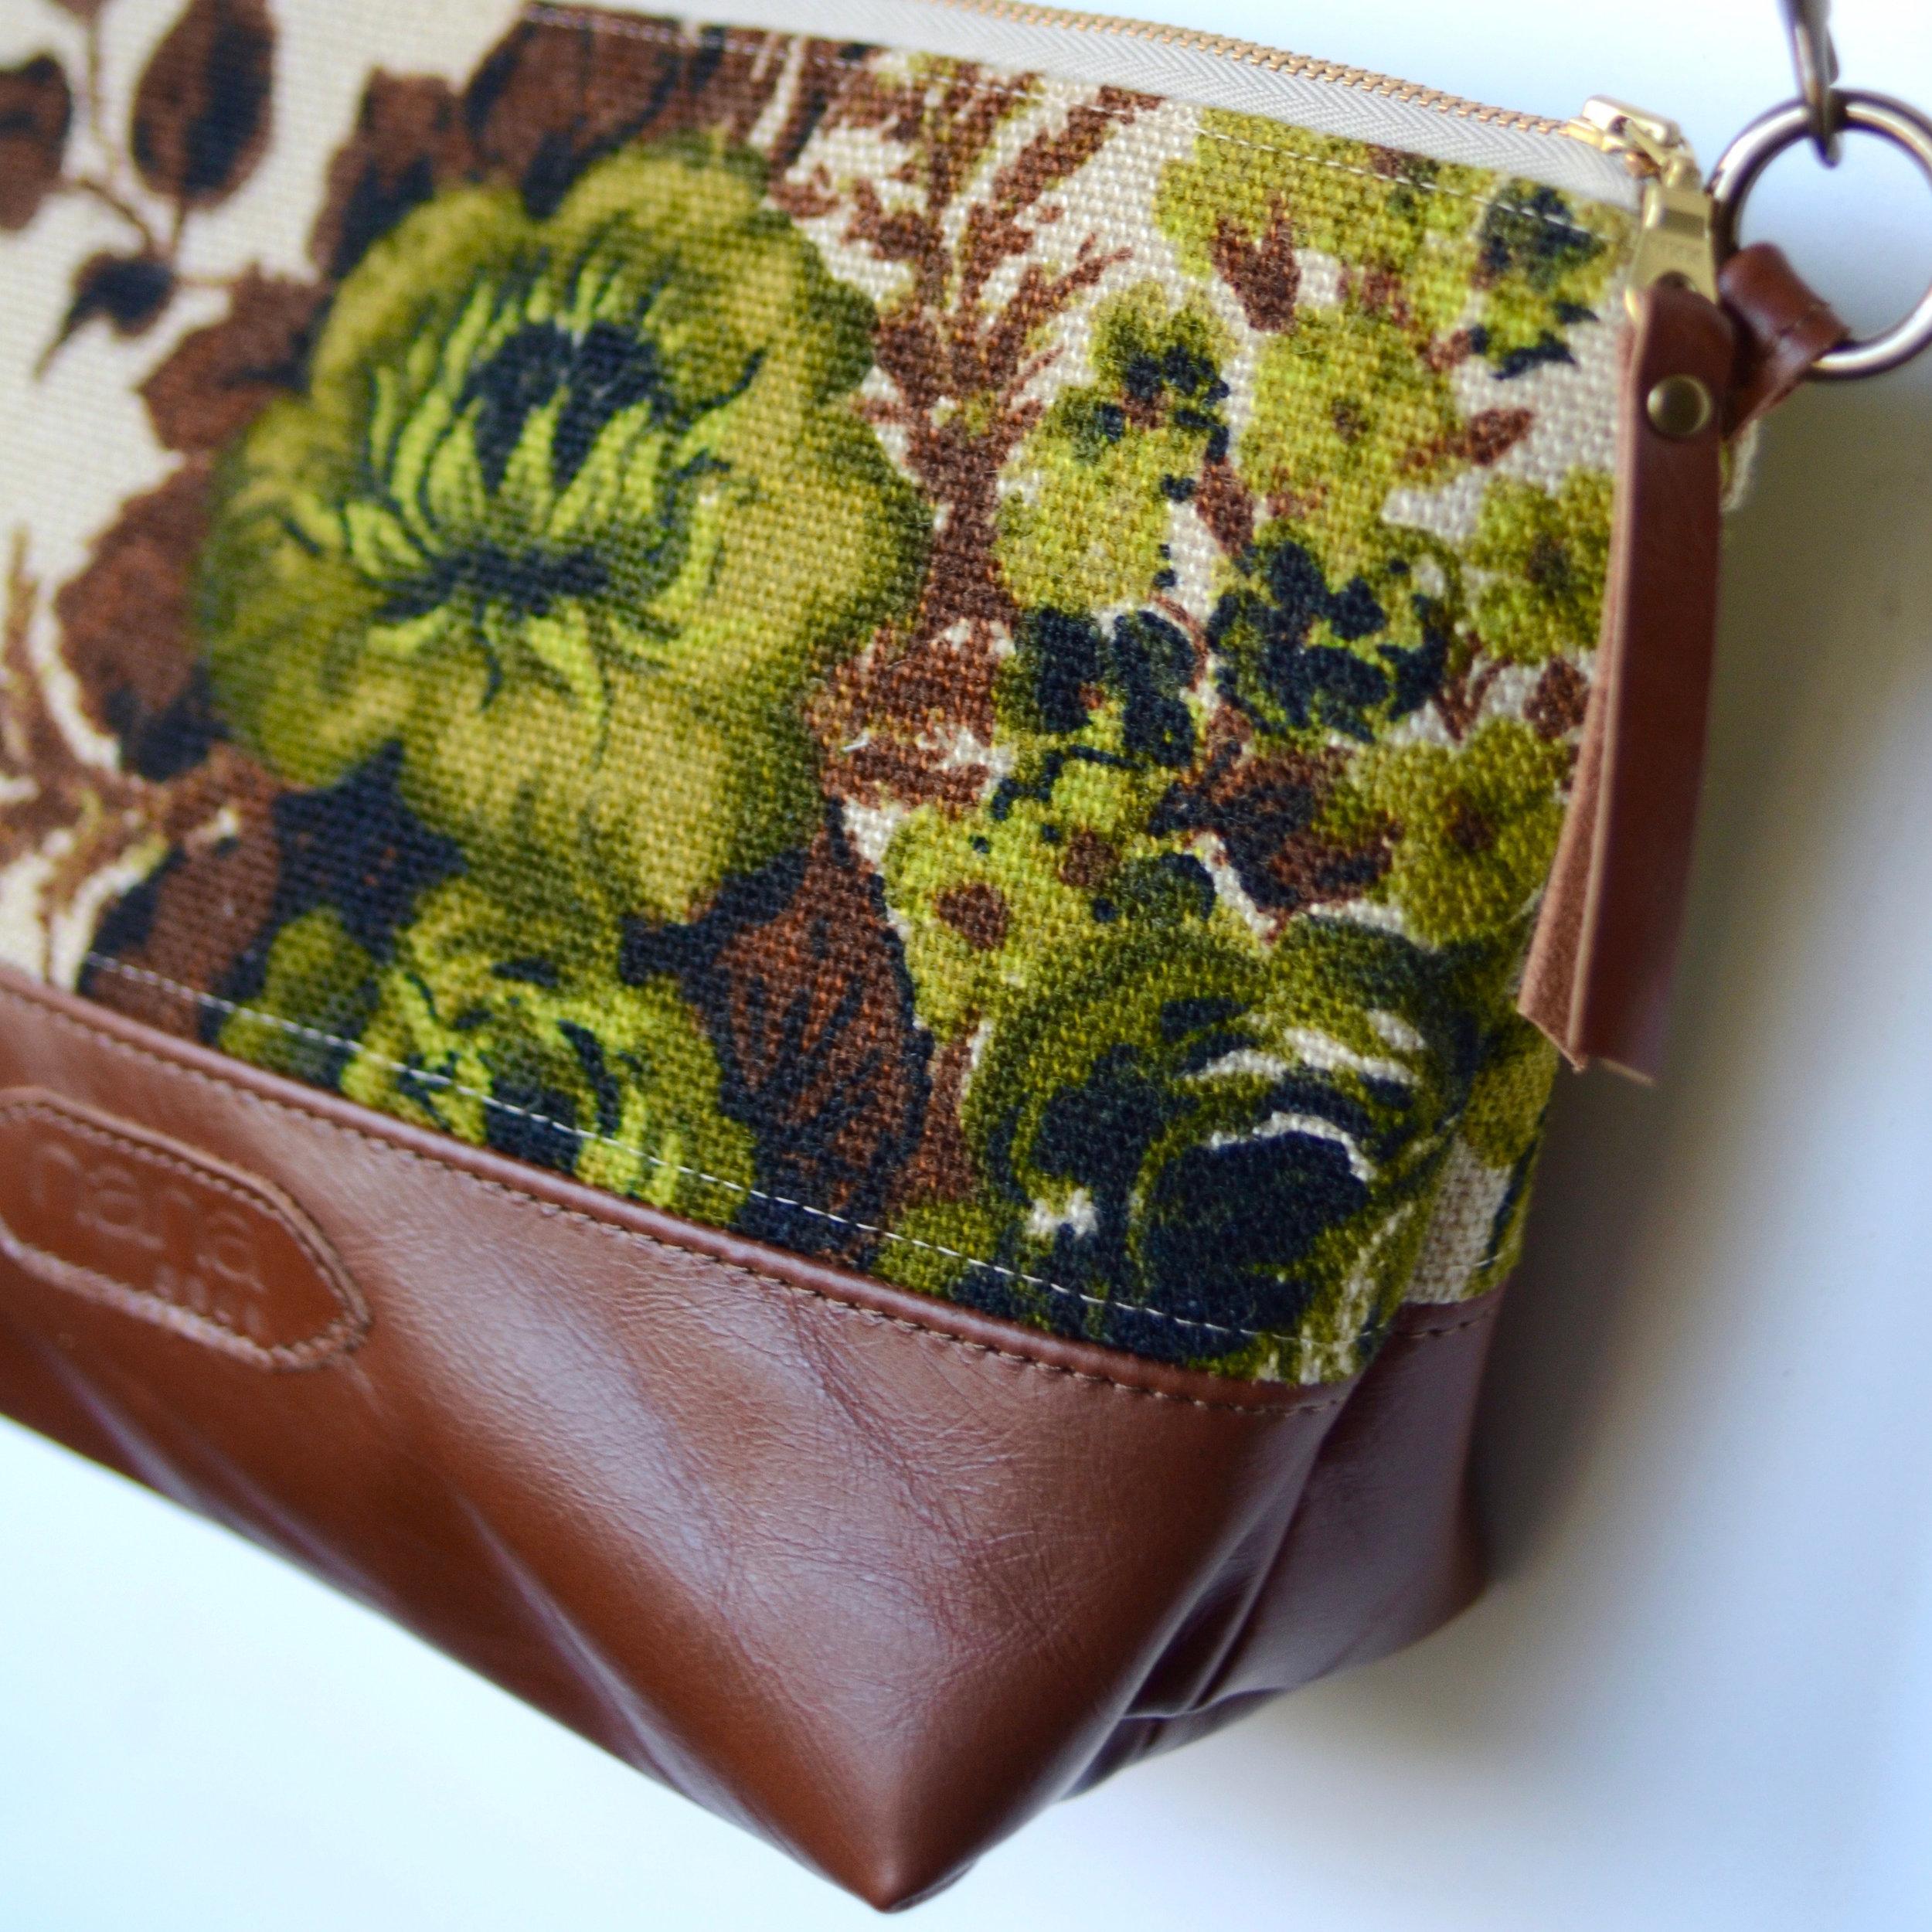 "Vintage Fabric + Leather Handbag, Textile, Leather and Hardware, 7.5"" x 12"""